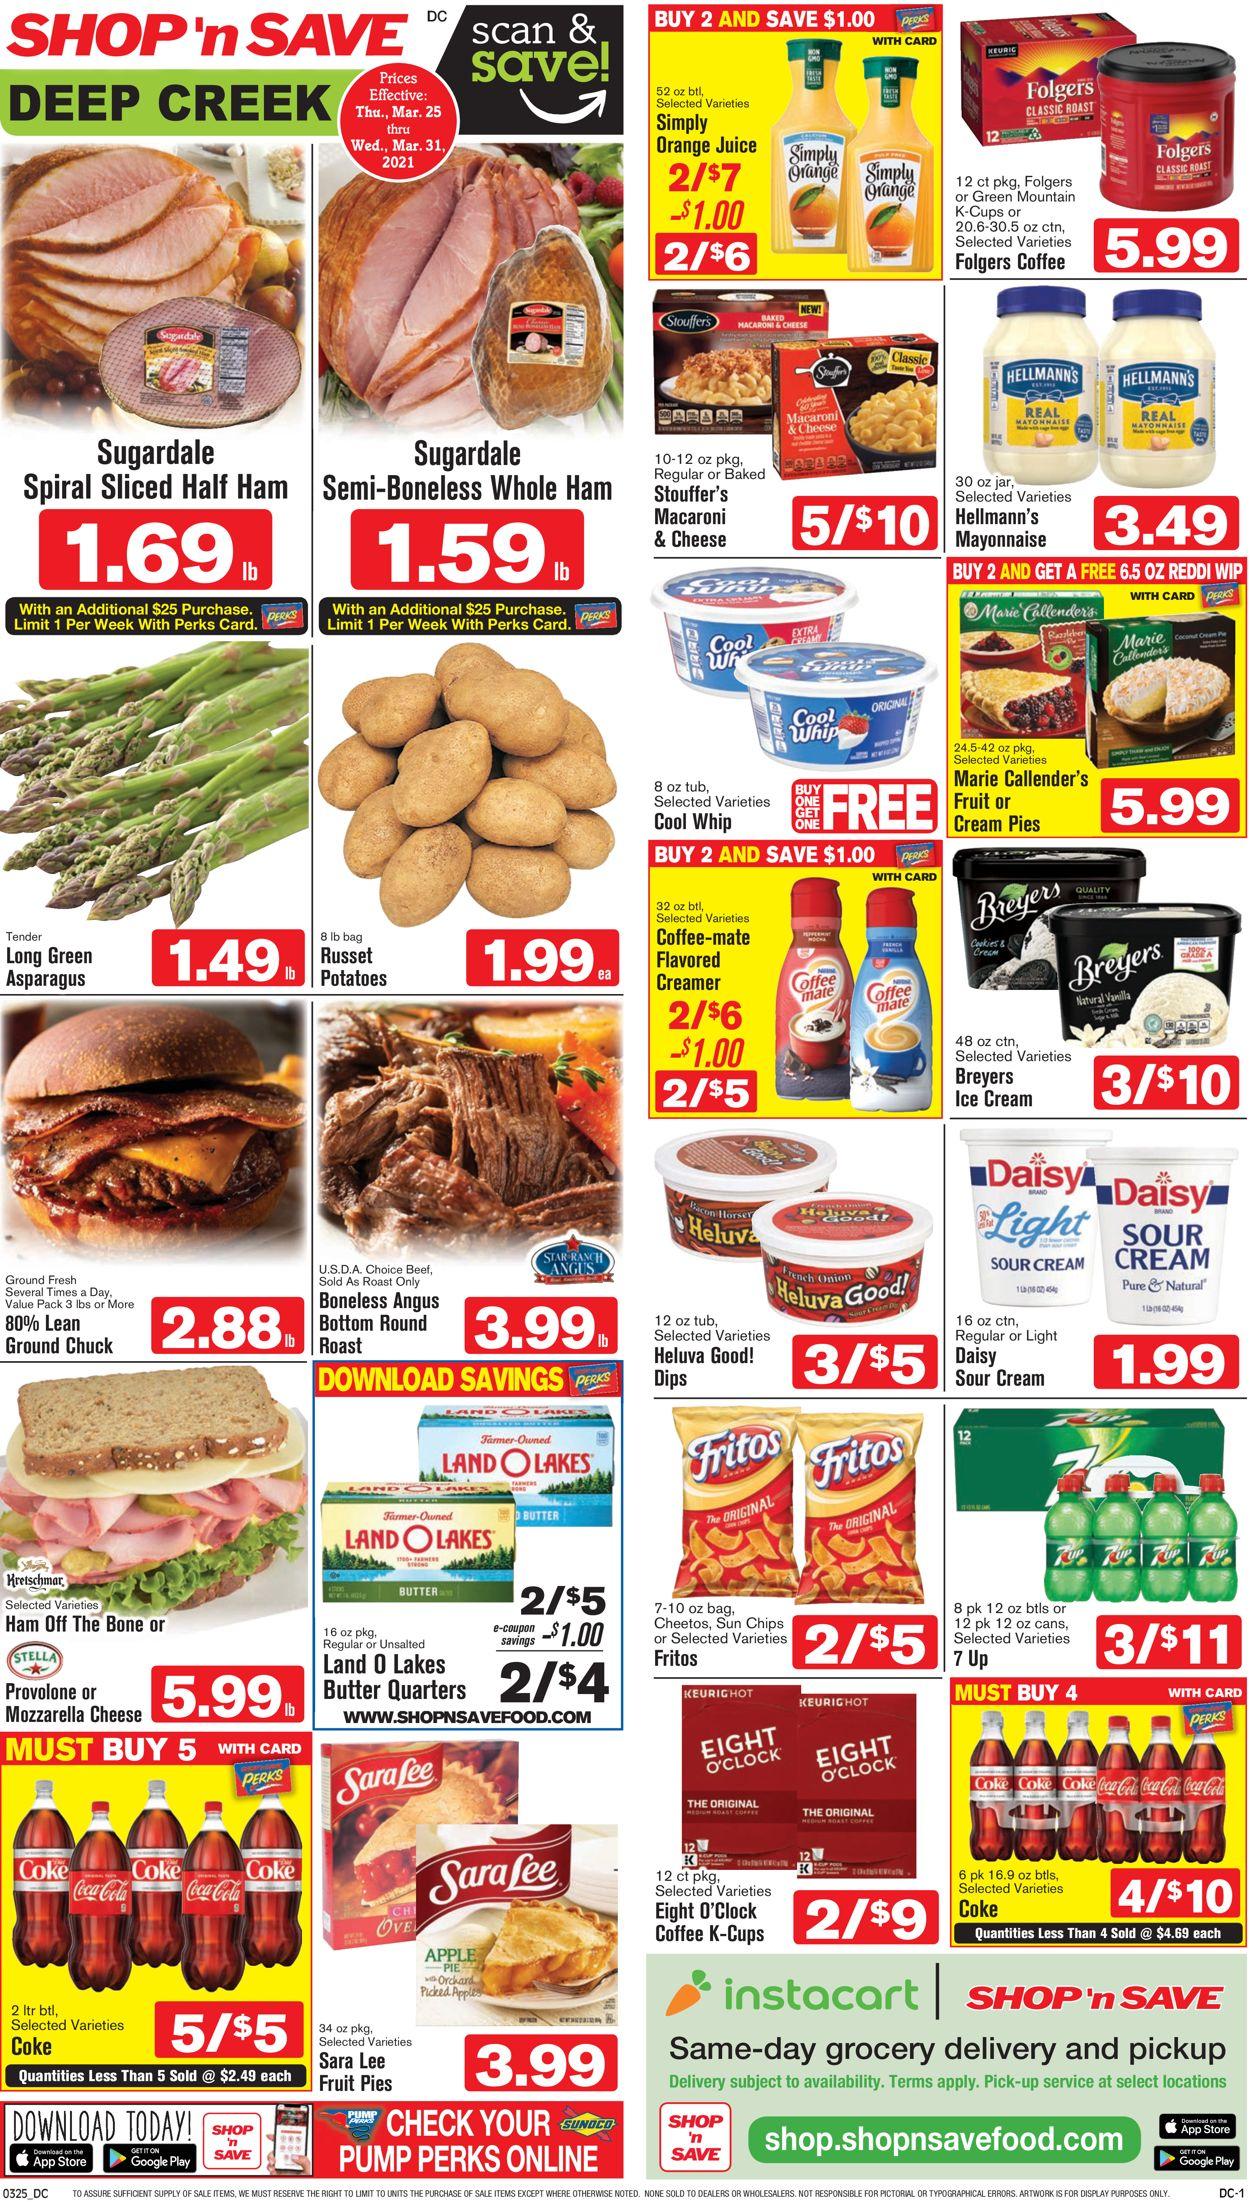 Shop 'n Save Weekly Ad Circular - valid 03/25-03/31/2021